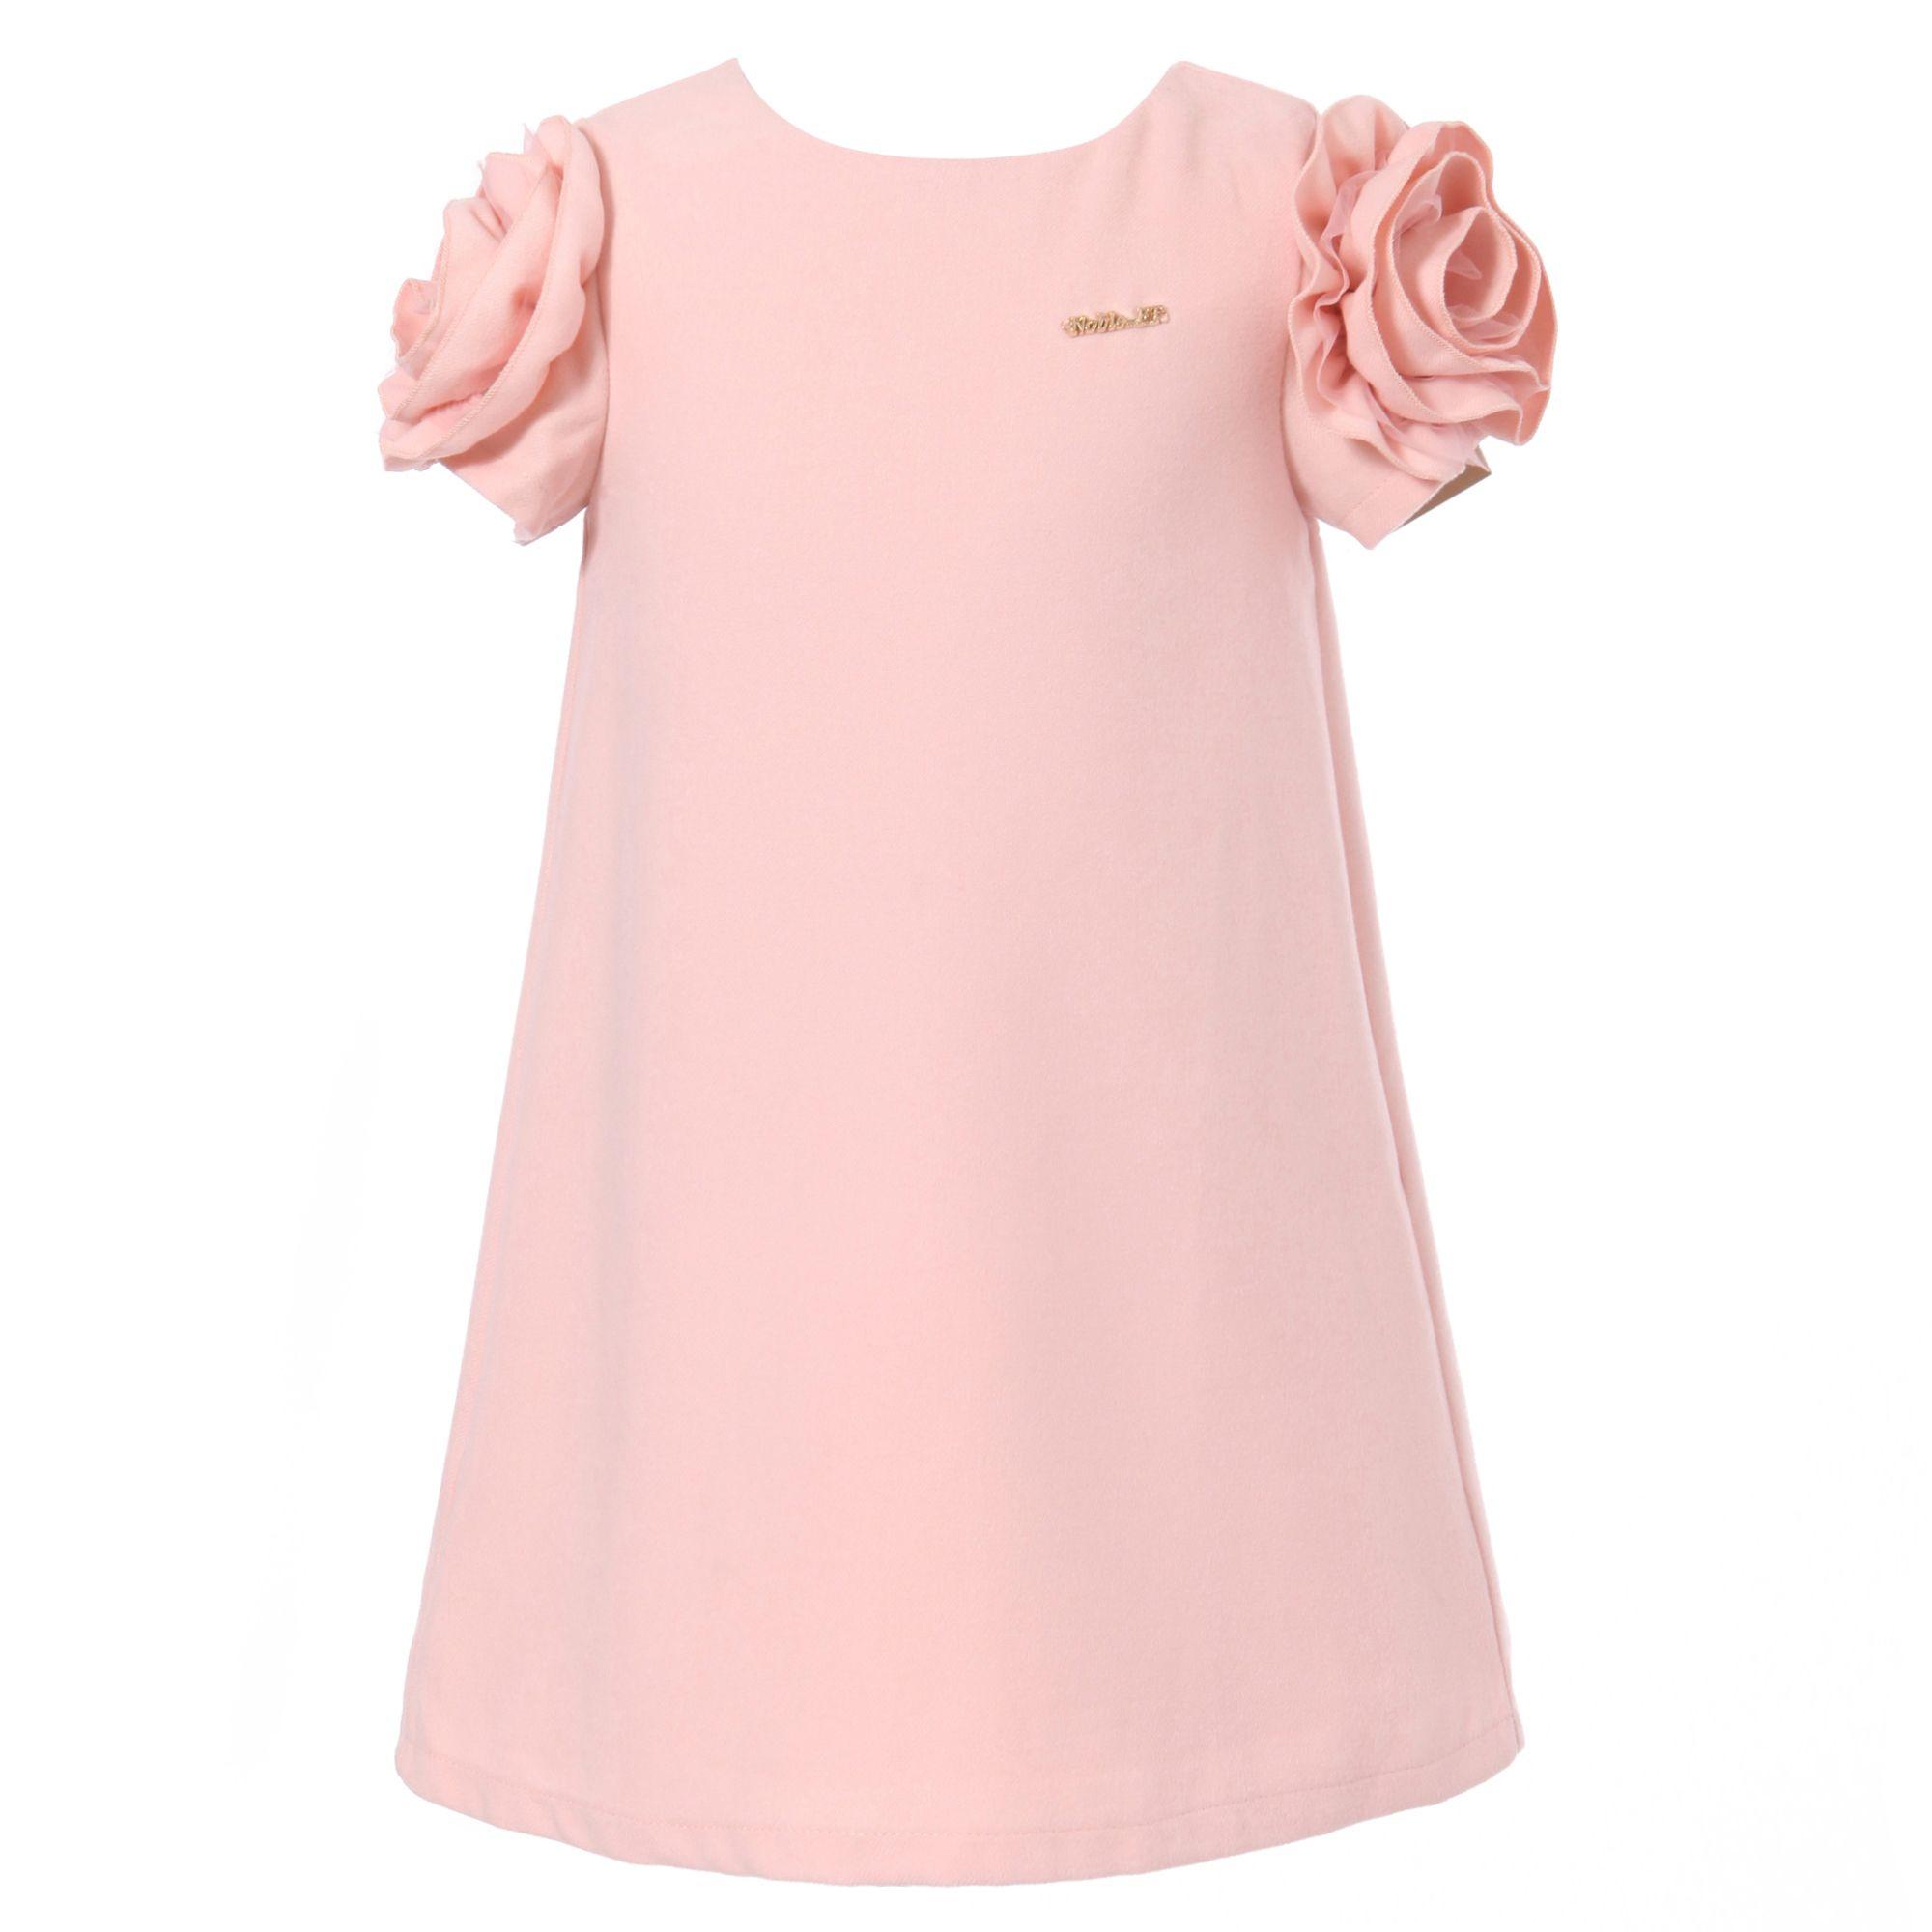 Richie House Richie House Girls Pink Flower Sleeve Slightly Flared Dress 7 8 Walmart Com Walmar Dresses Kids Girl Little Girl Fashion Little Girl Dresses [ 2000 x 2000 Pixel ]